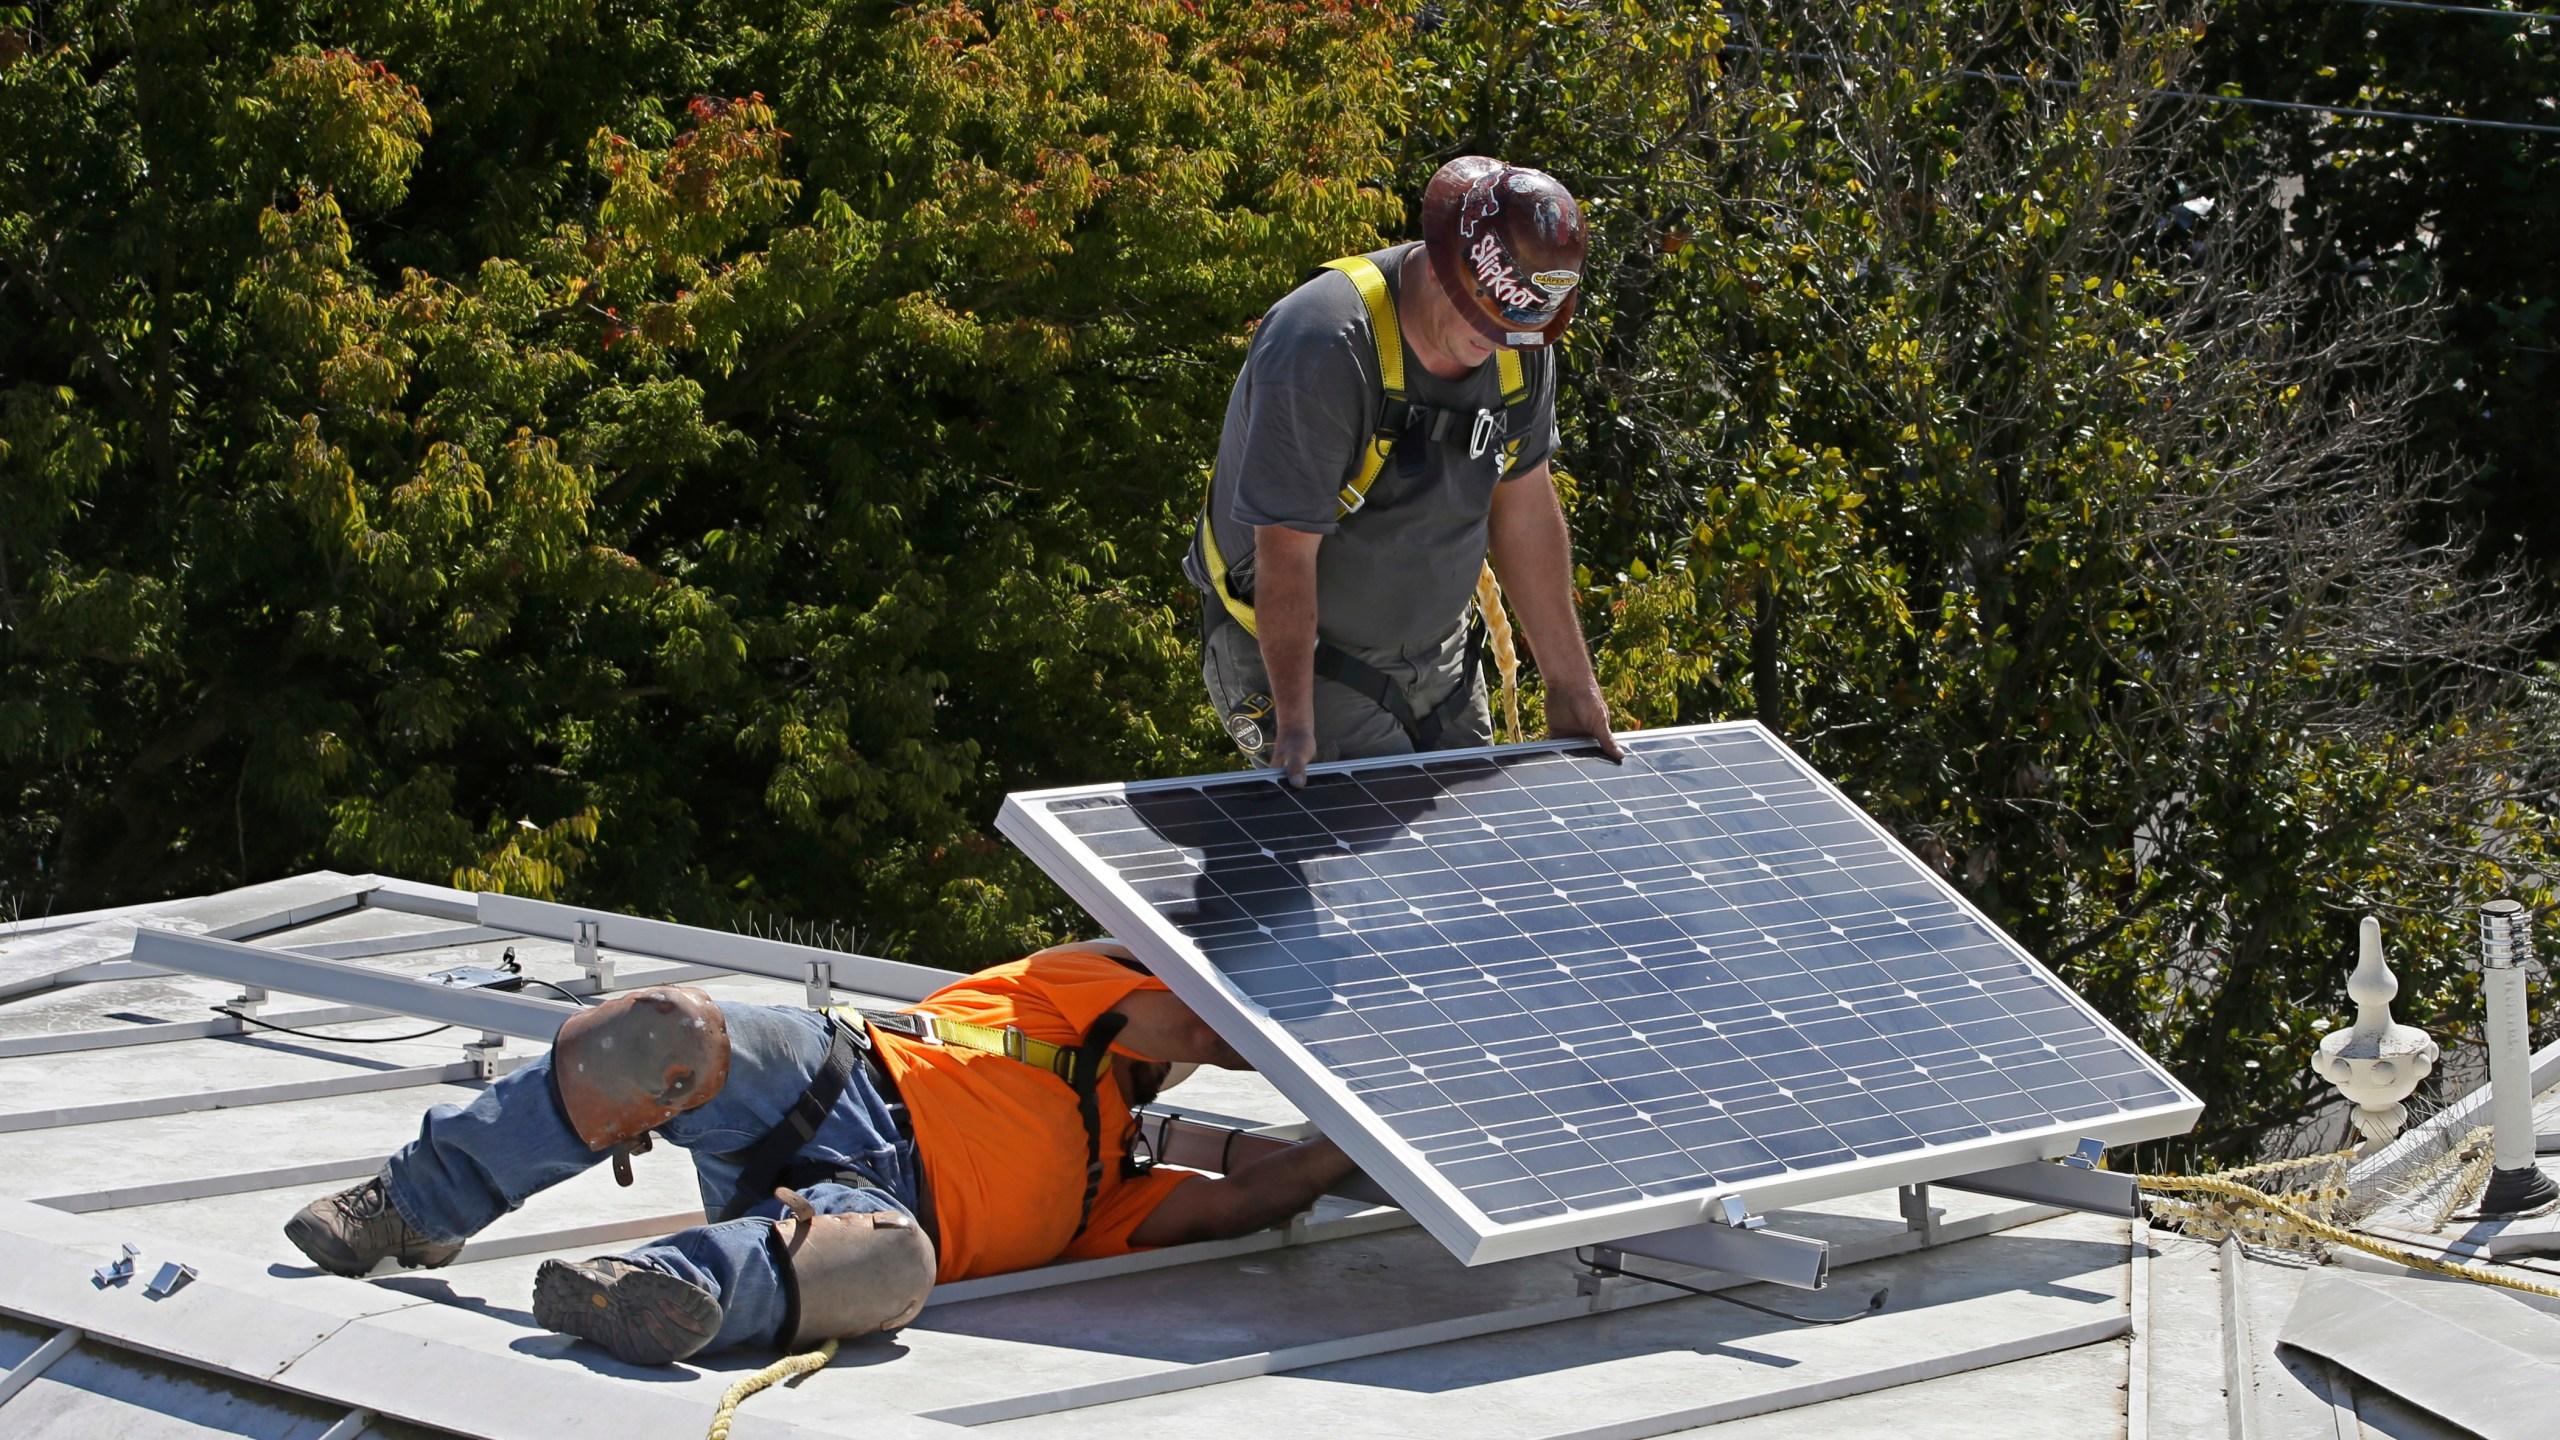 California_Solar_Panels_43188-159532.jpg91392027